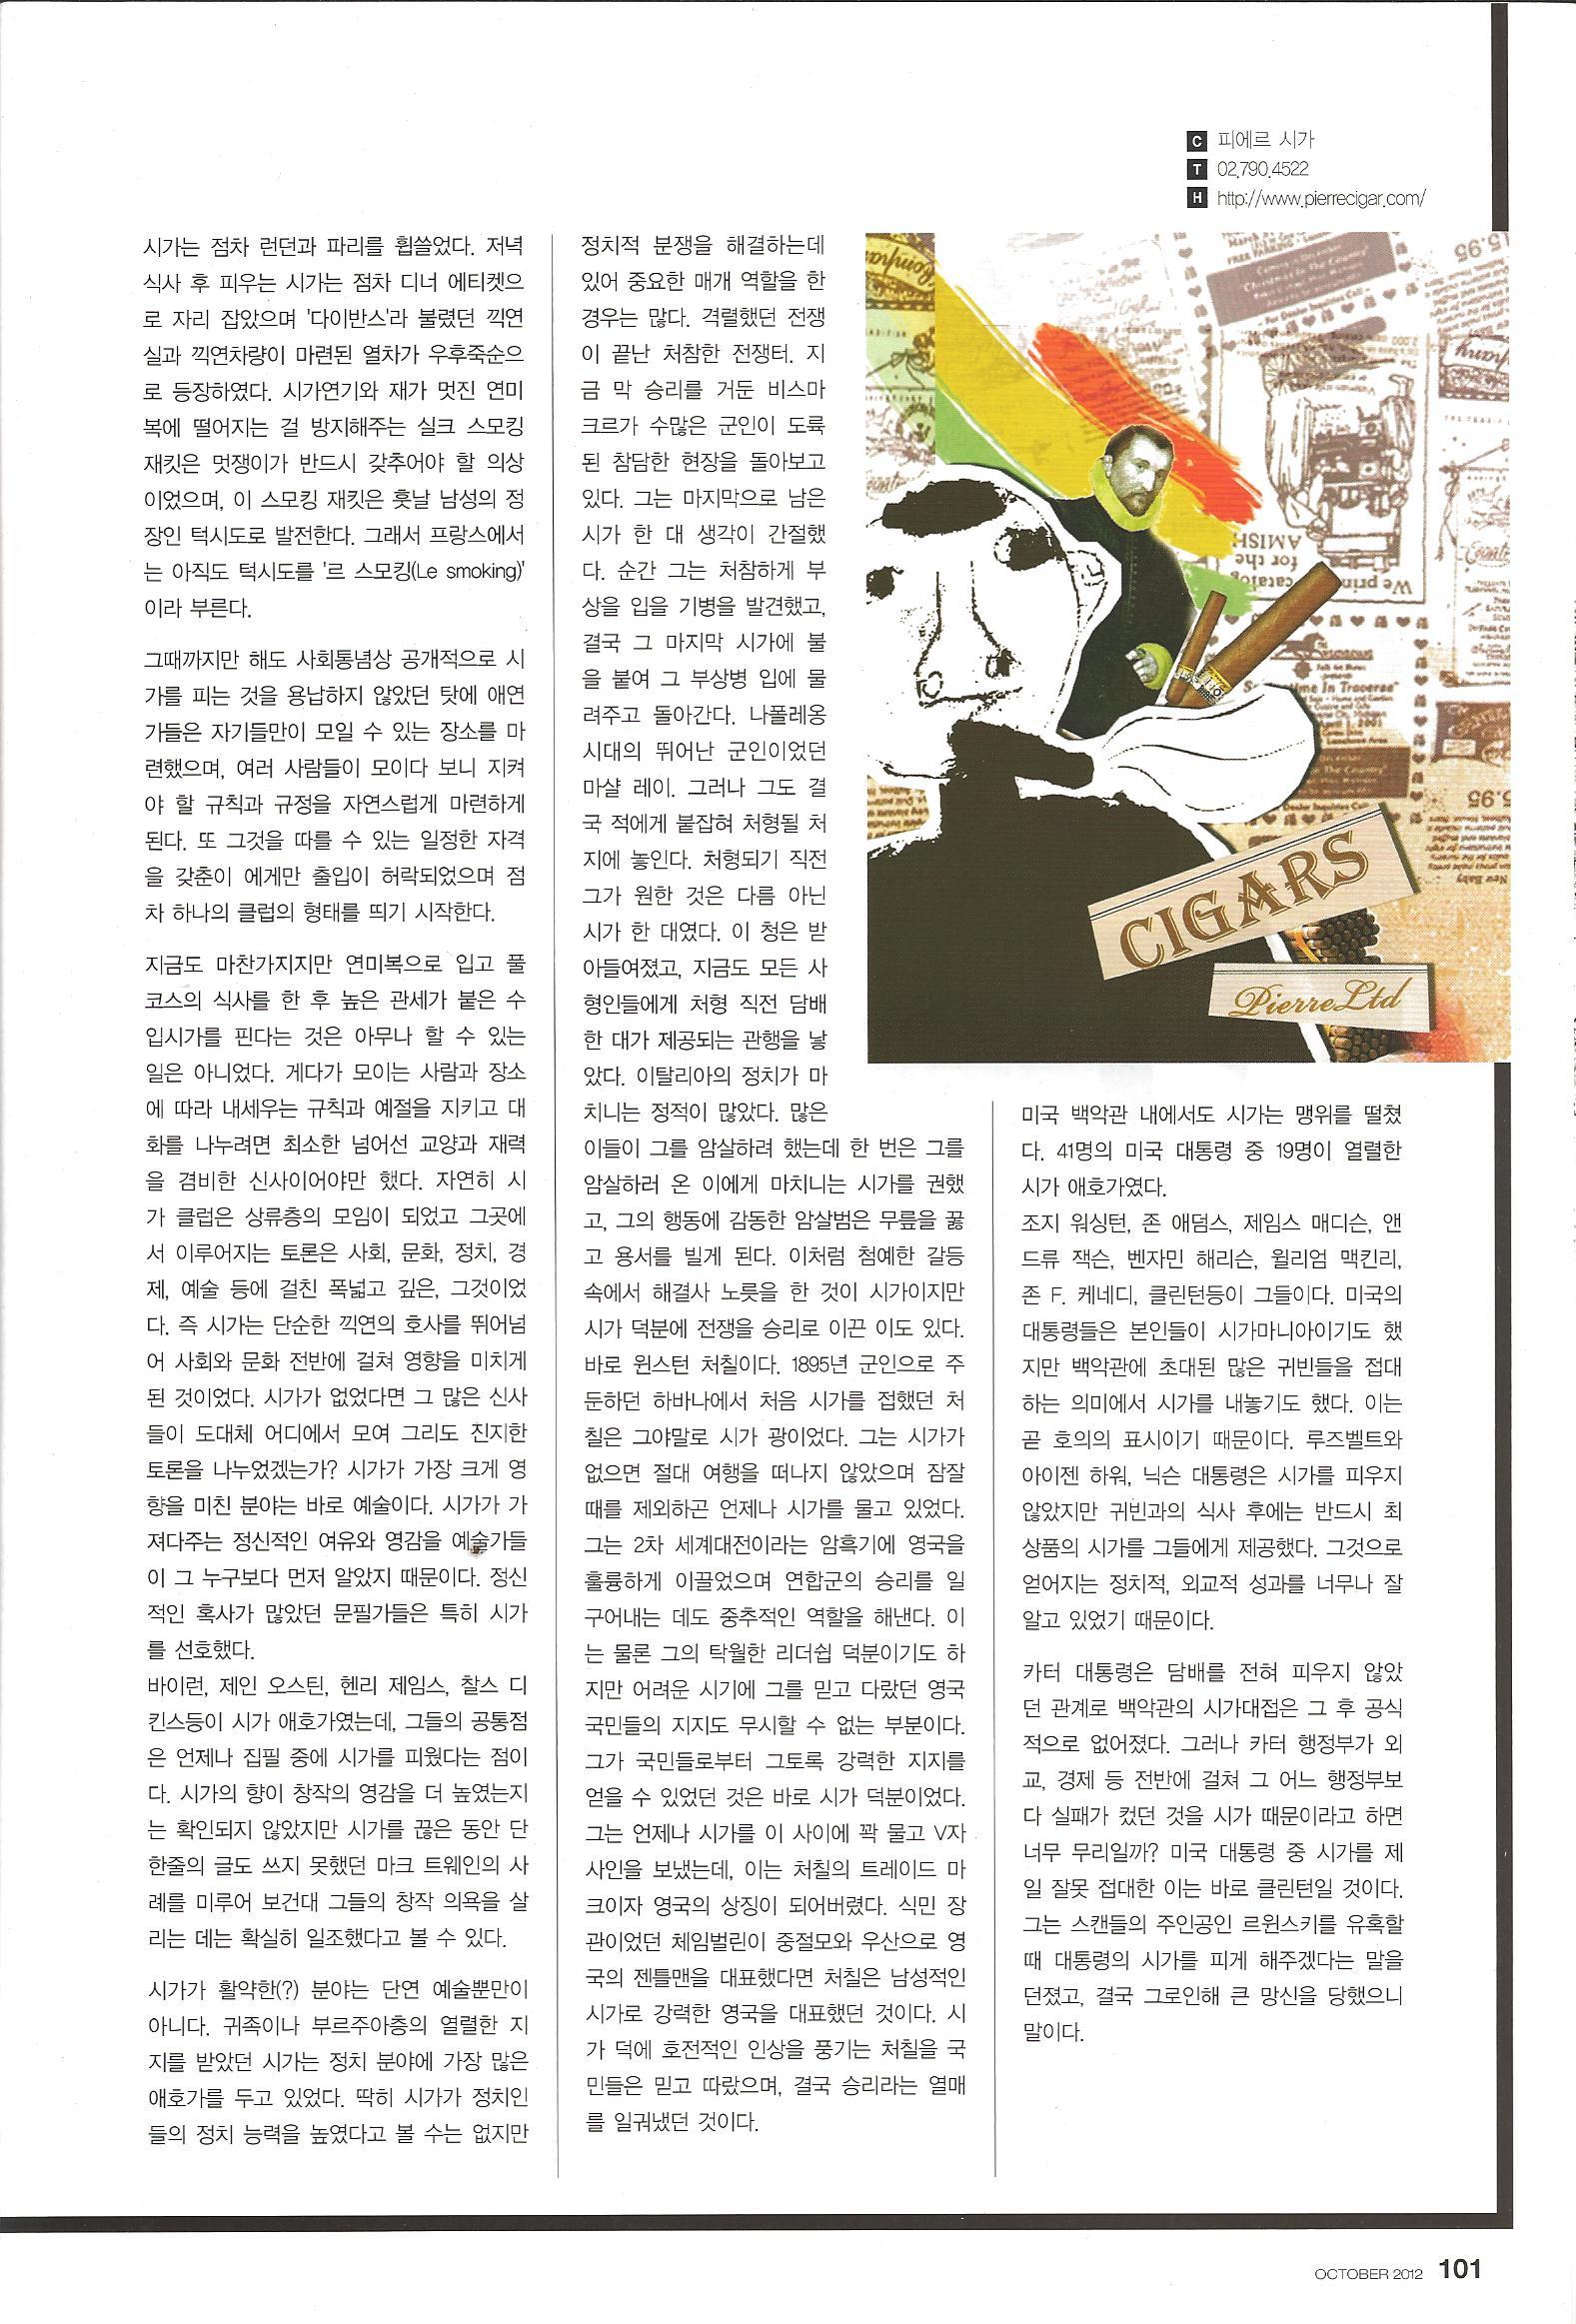 2012-10 A-Z article 2.jpg